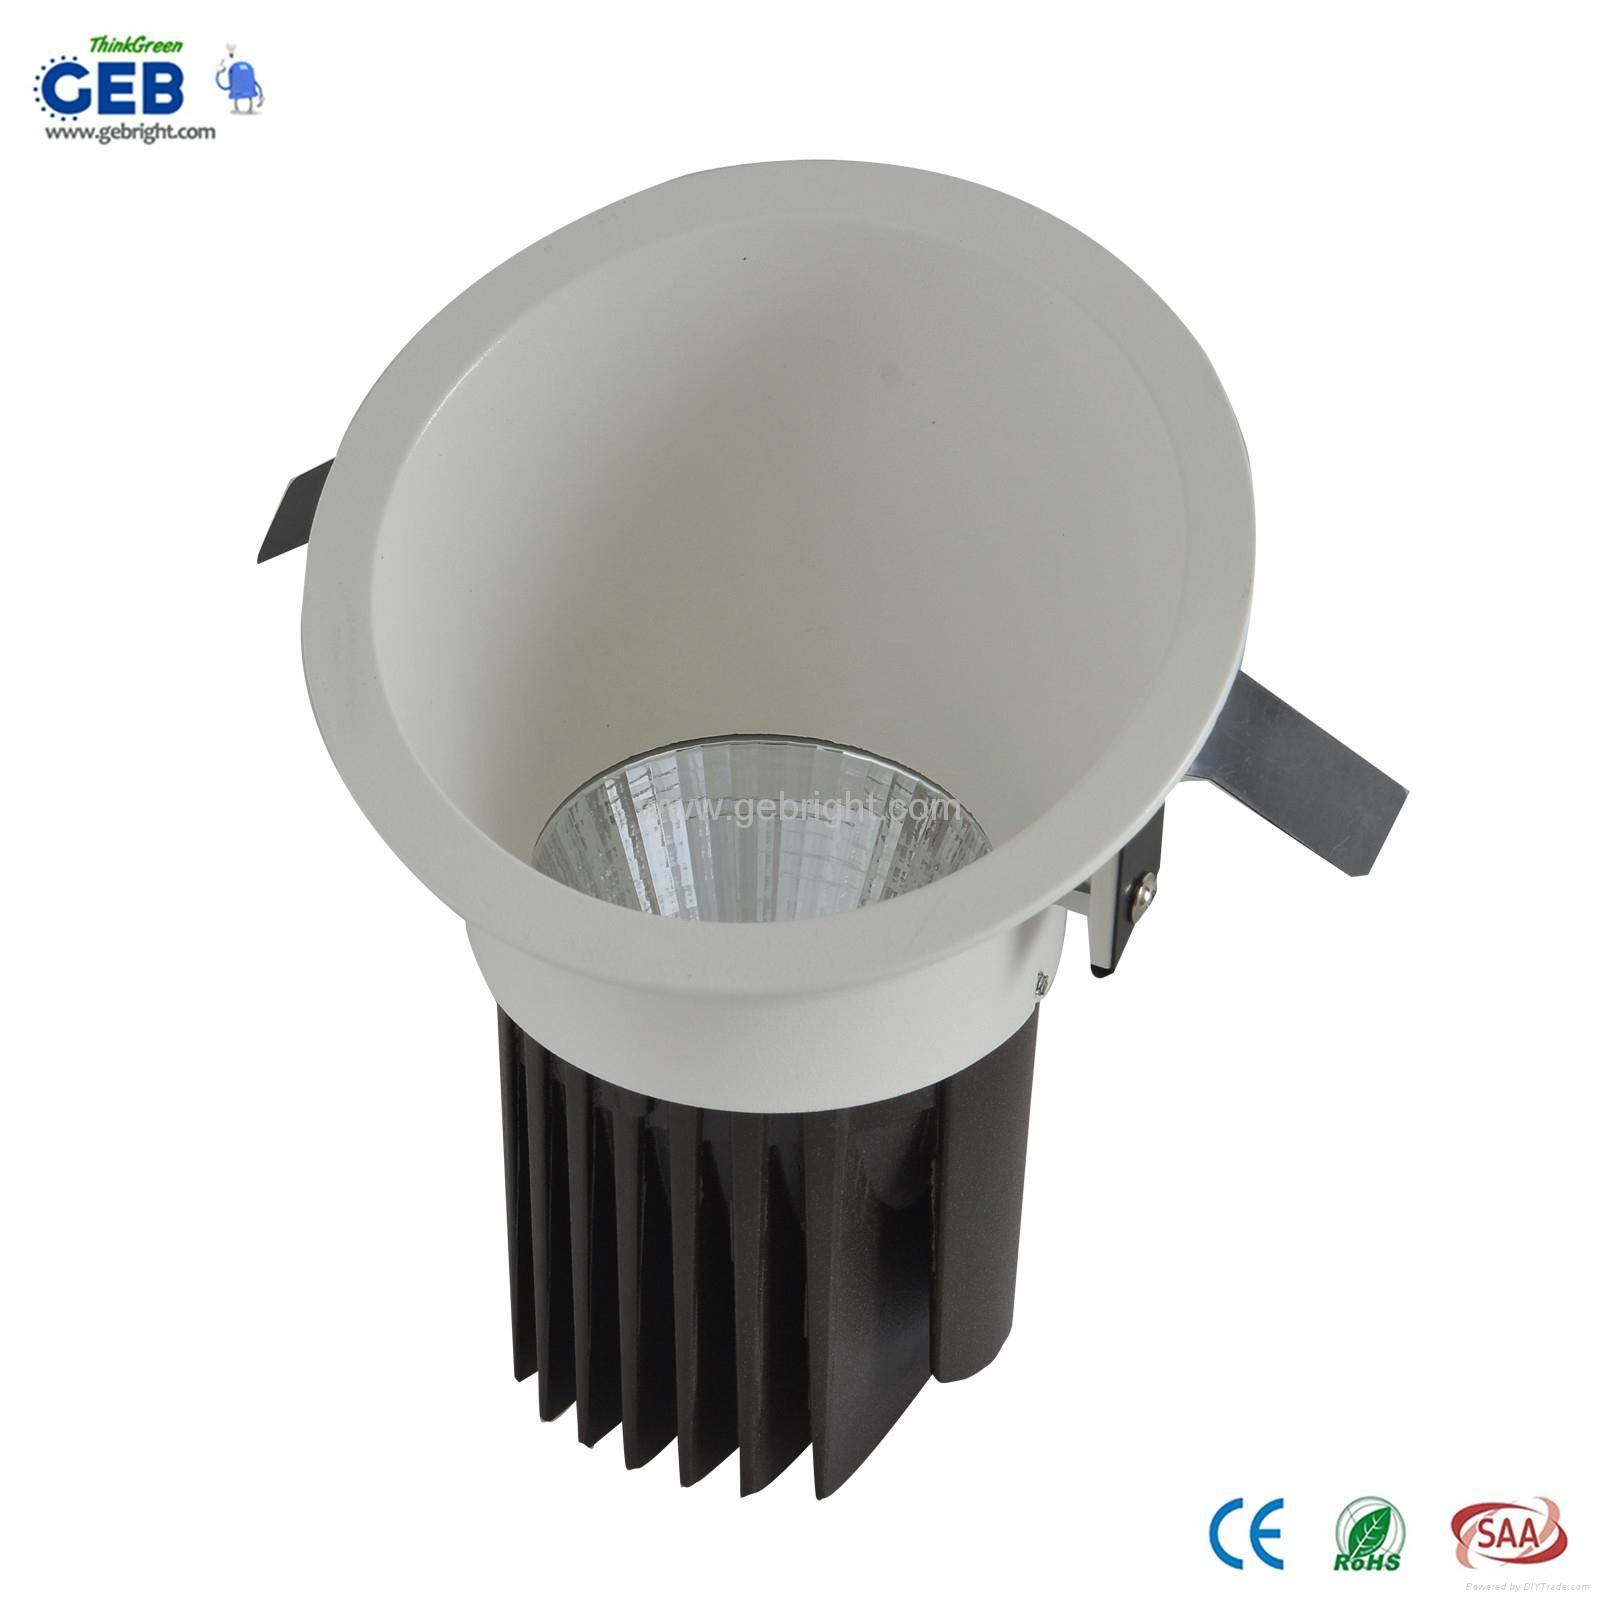 8W 85-265VAC 800lm LED COB Downlight Recessed Lighting 1